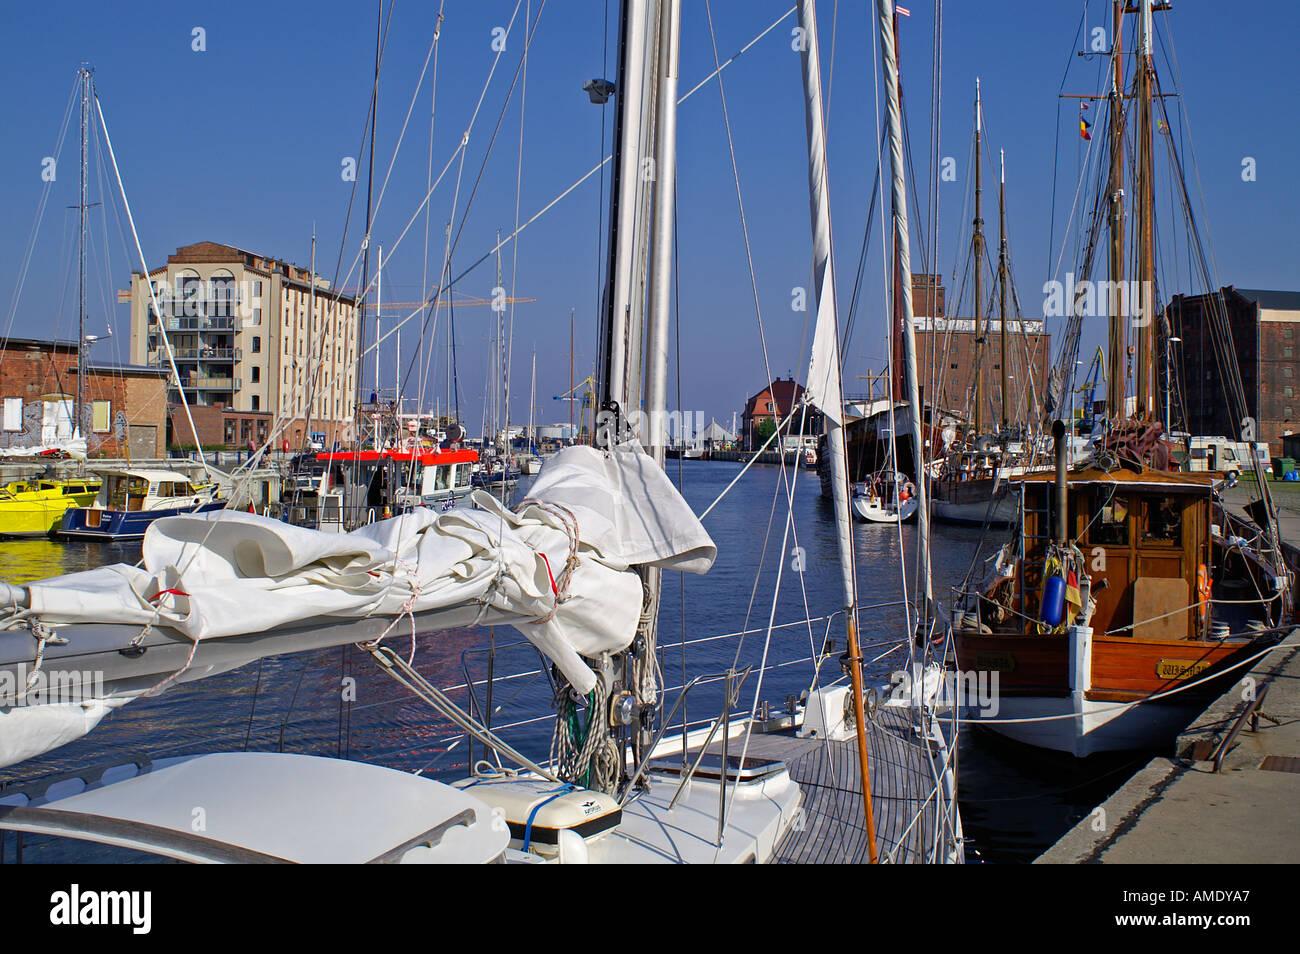 Alter Hafen habor Wismar sailing boat - Stock Image